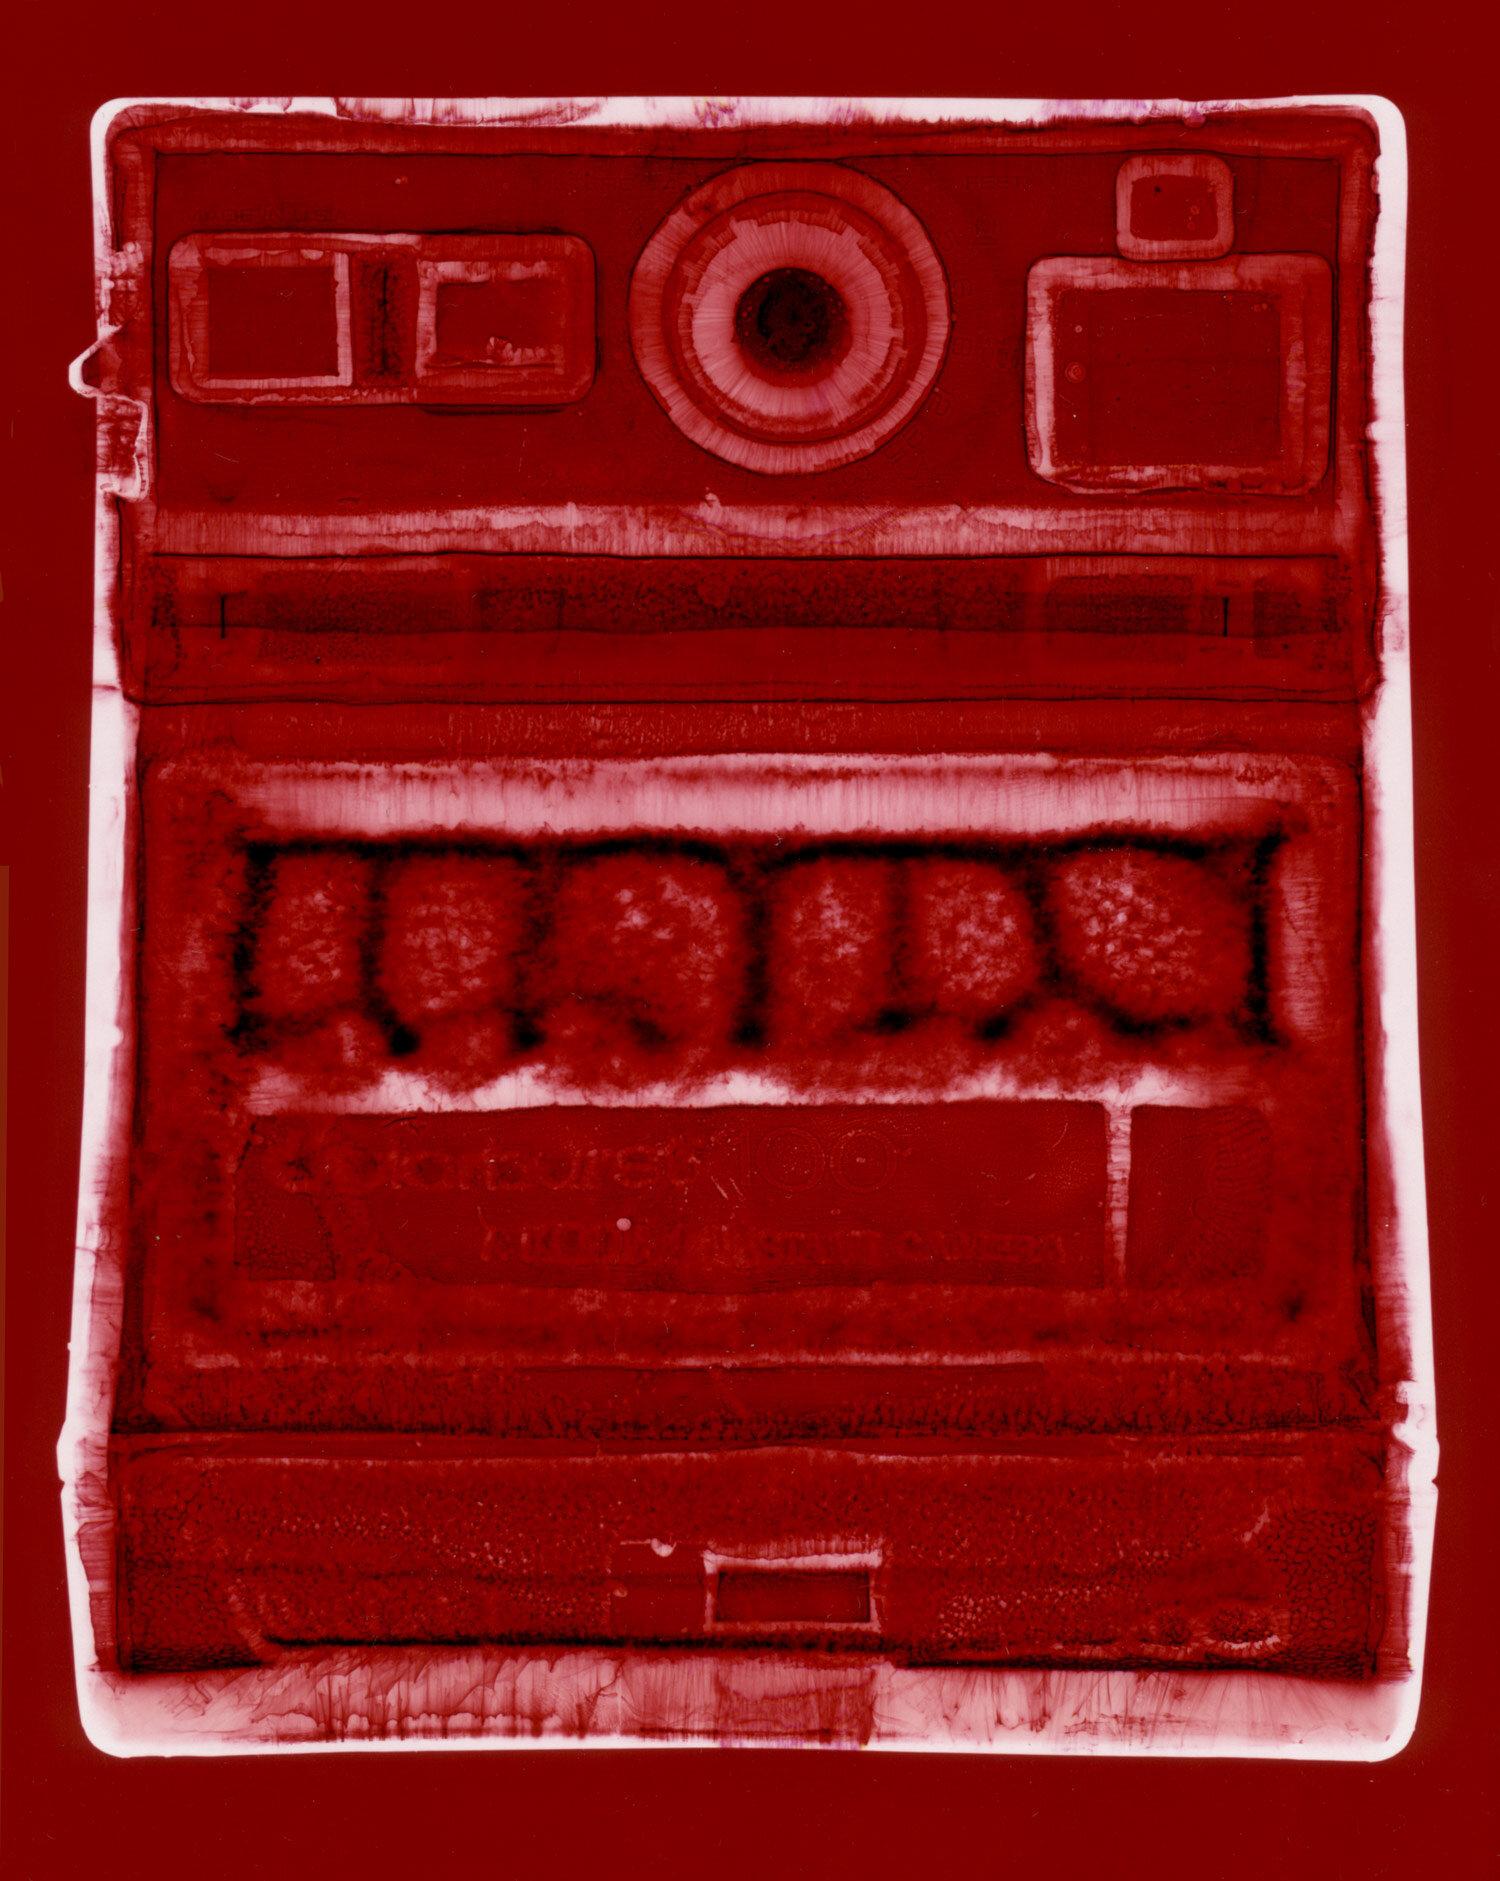 Colourburst 100 (red),  Penelope Davis, 2003, type c print, 125x94cm